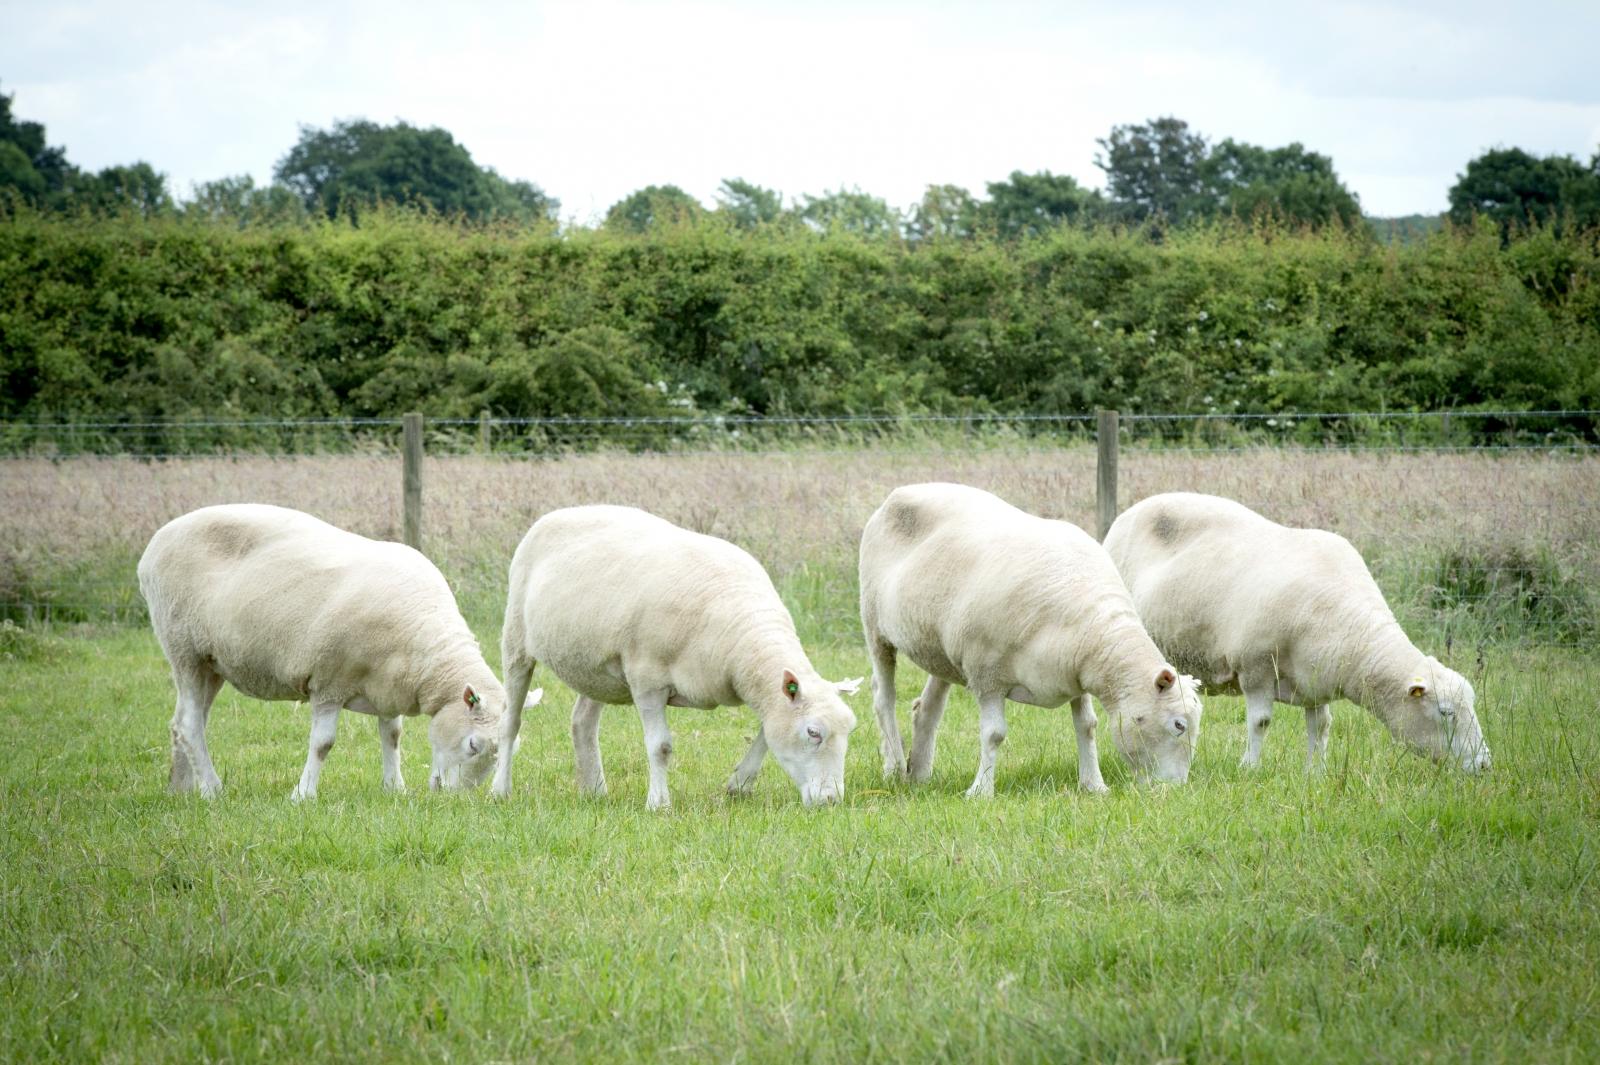 sheep cloning ageing